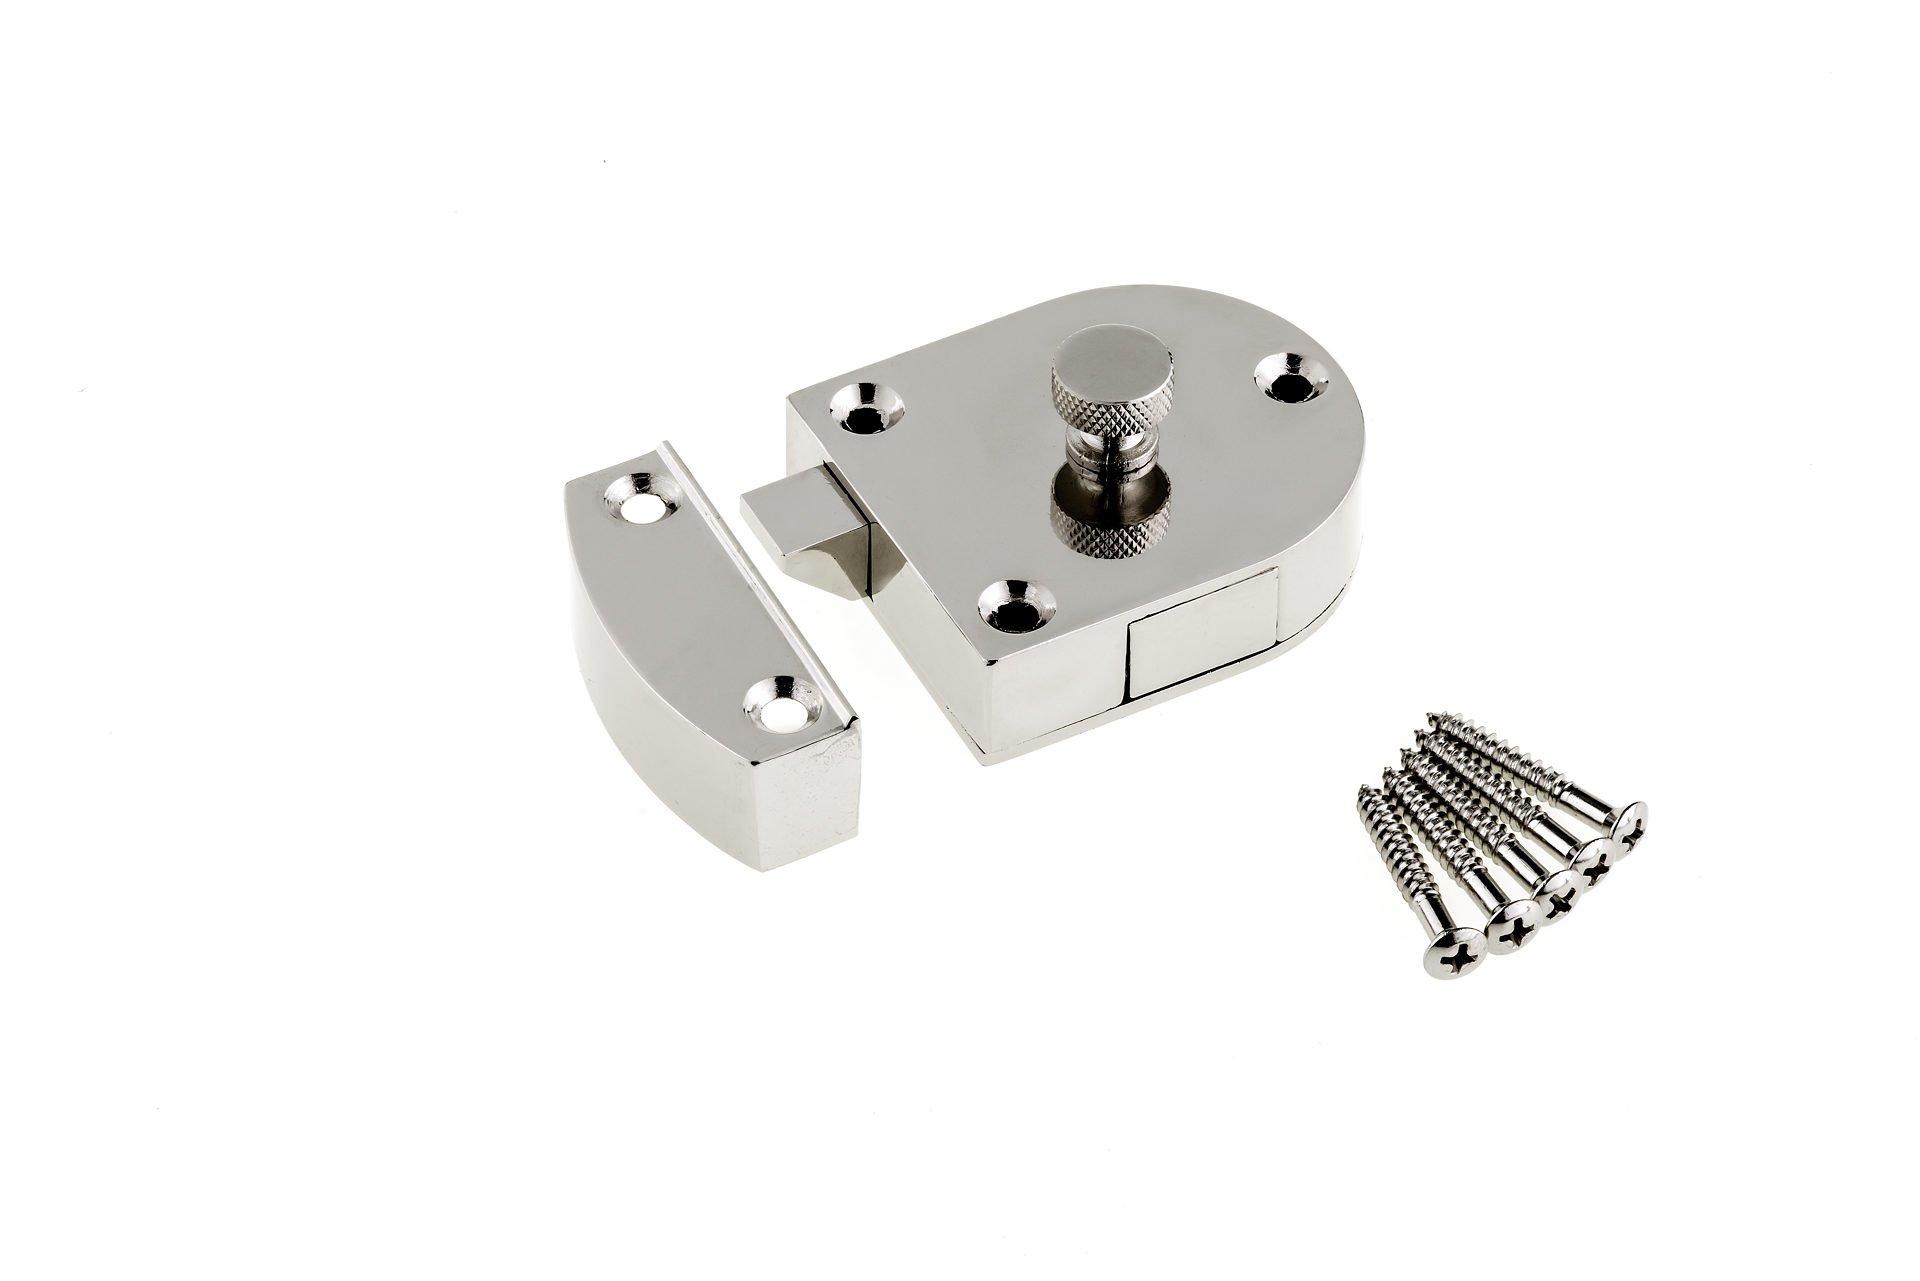 Richelieu Hardware - BP600100 - Secret Gate Latch - 600 - Metal  Finish